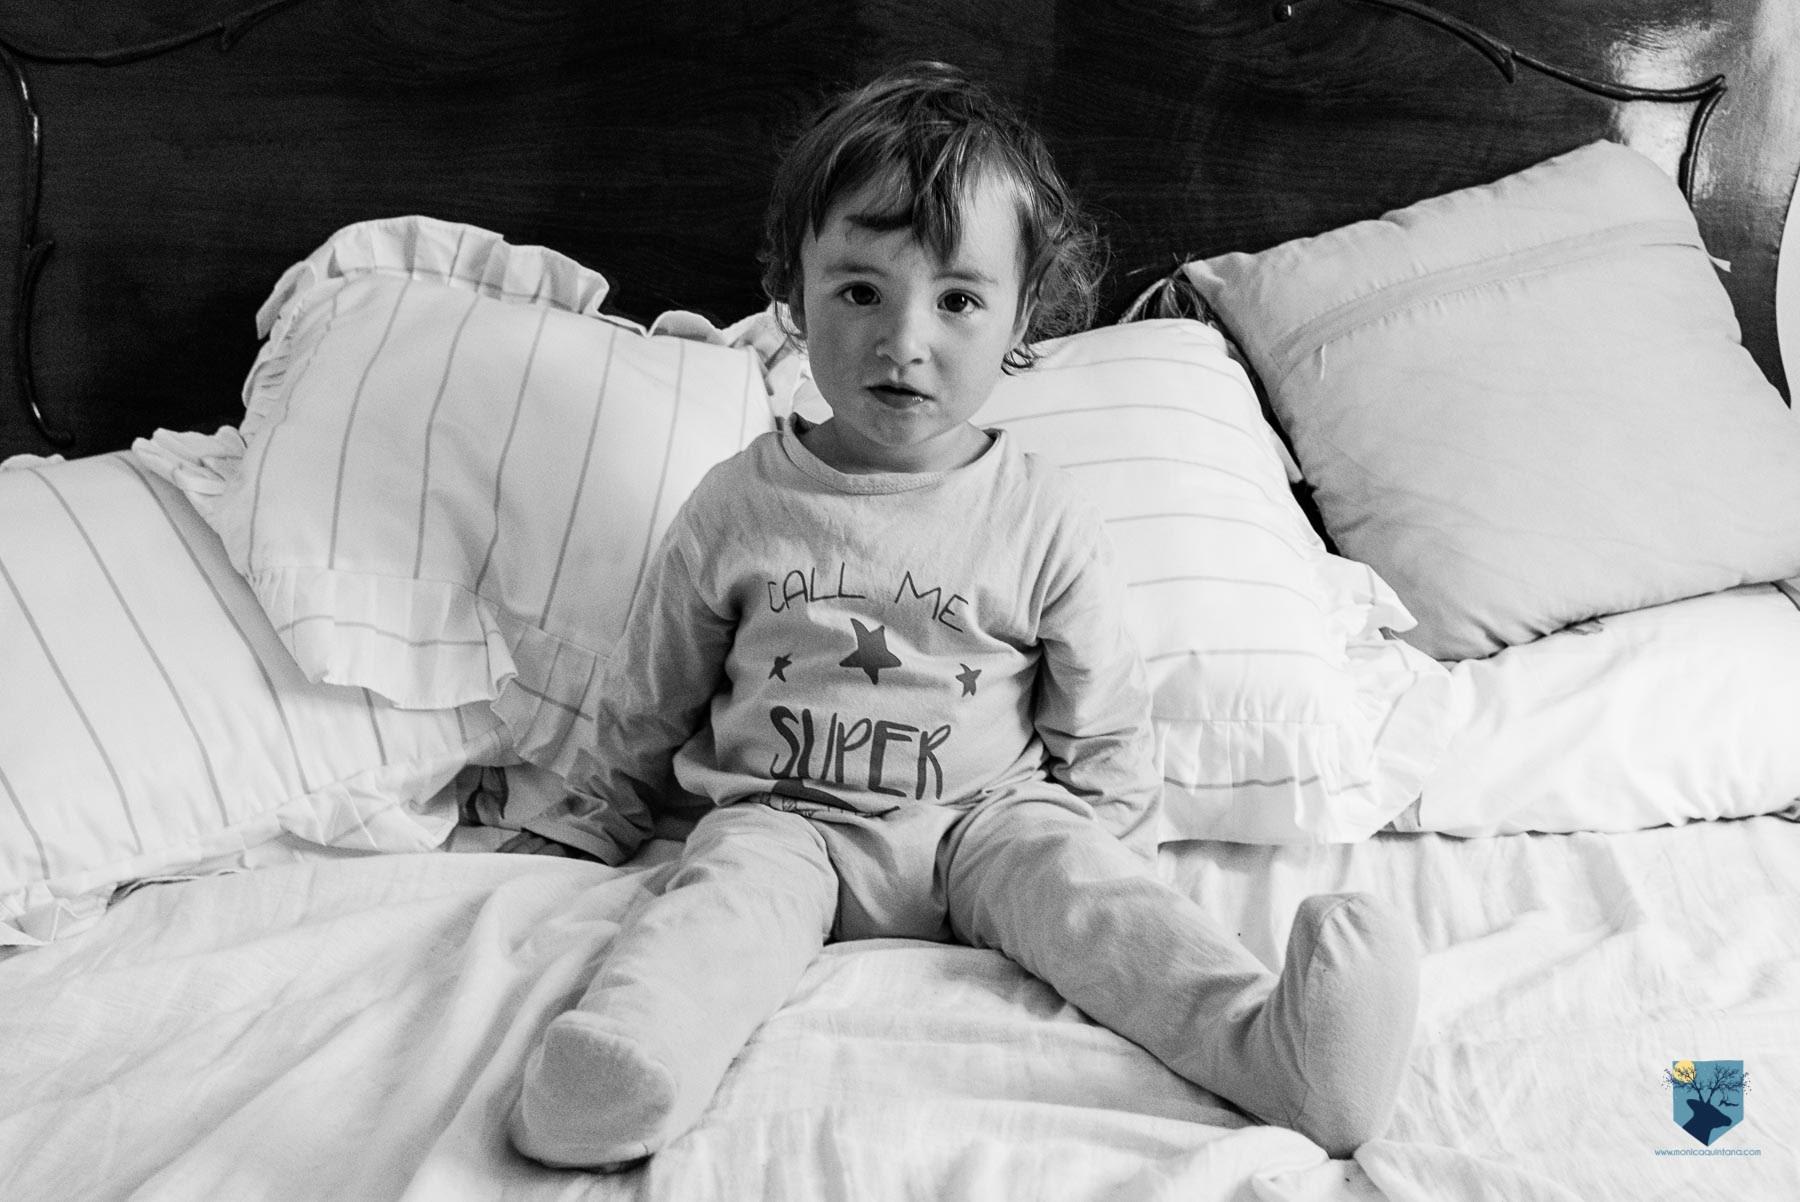 fotografia-fotos-girona-figueres-emporda-monica-quintana-niños-niñas-familia-retrato-verano-ideas-fotos familiares